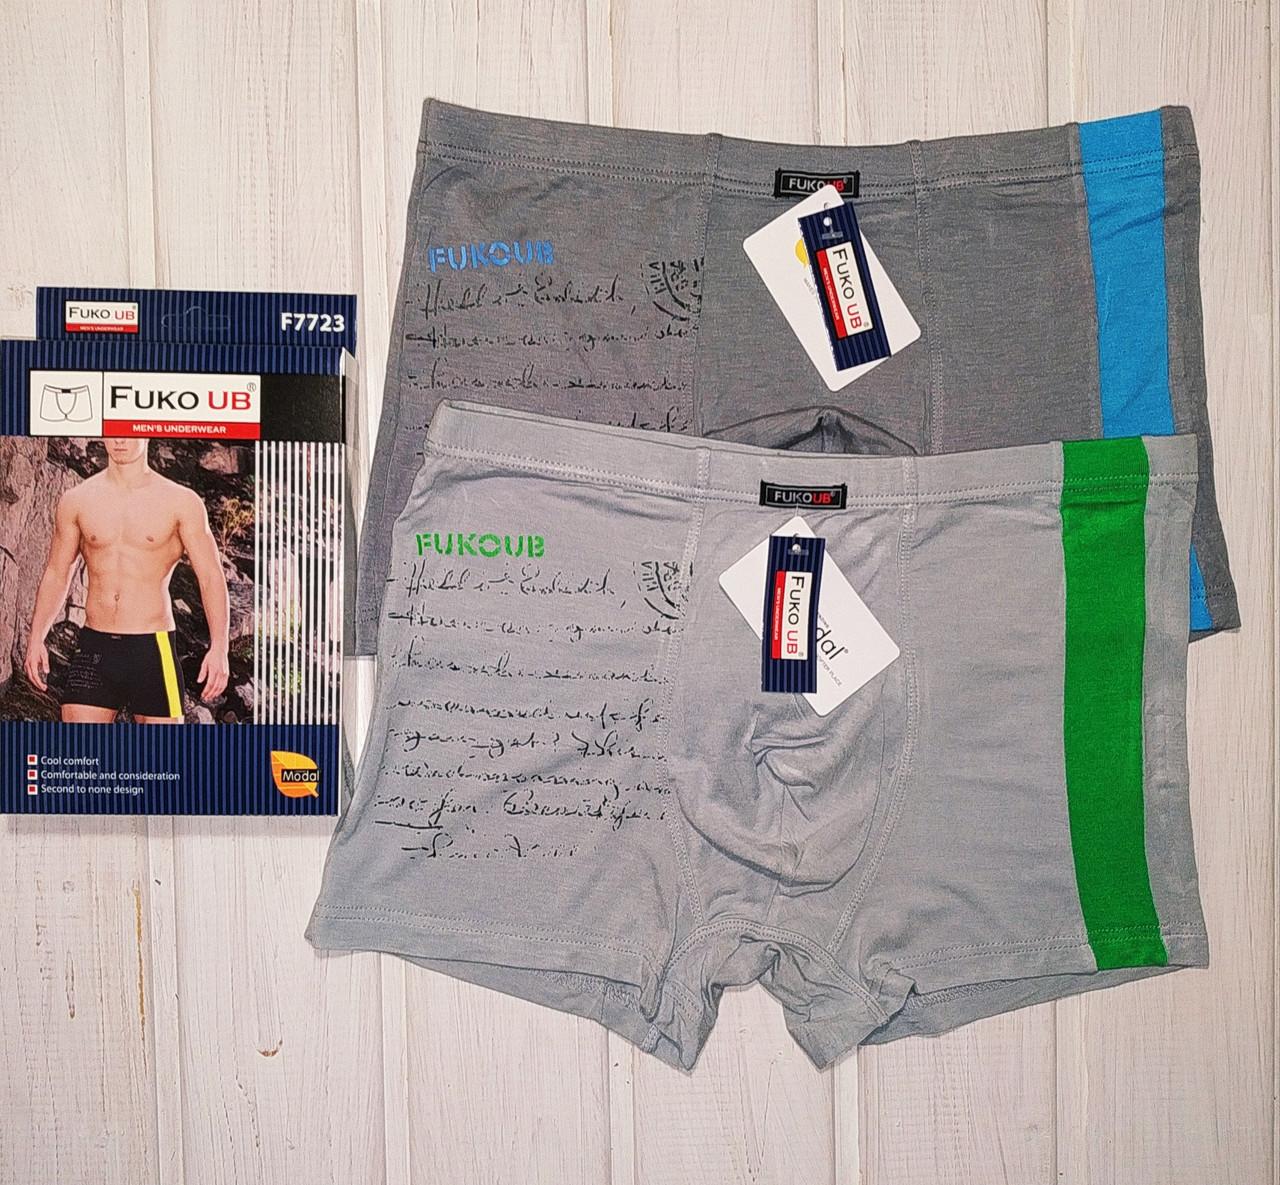 Трусы шорты боксеры Fuko Ub 7723 комплект 2шт XL серые